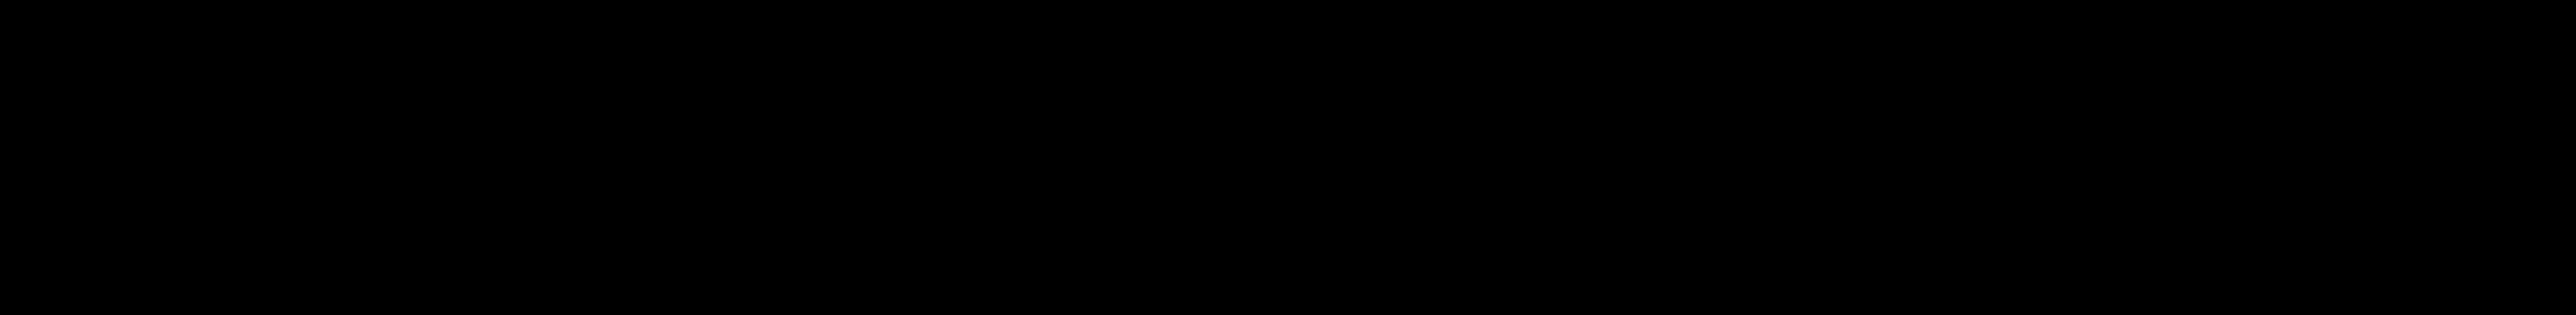 aeropostale logo 1 - Aeropostale Logo